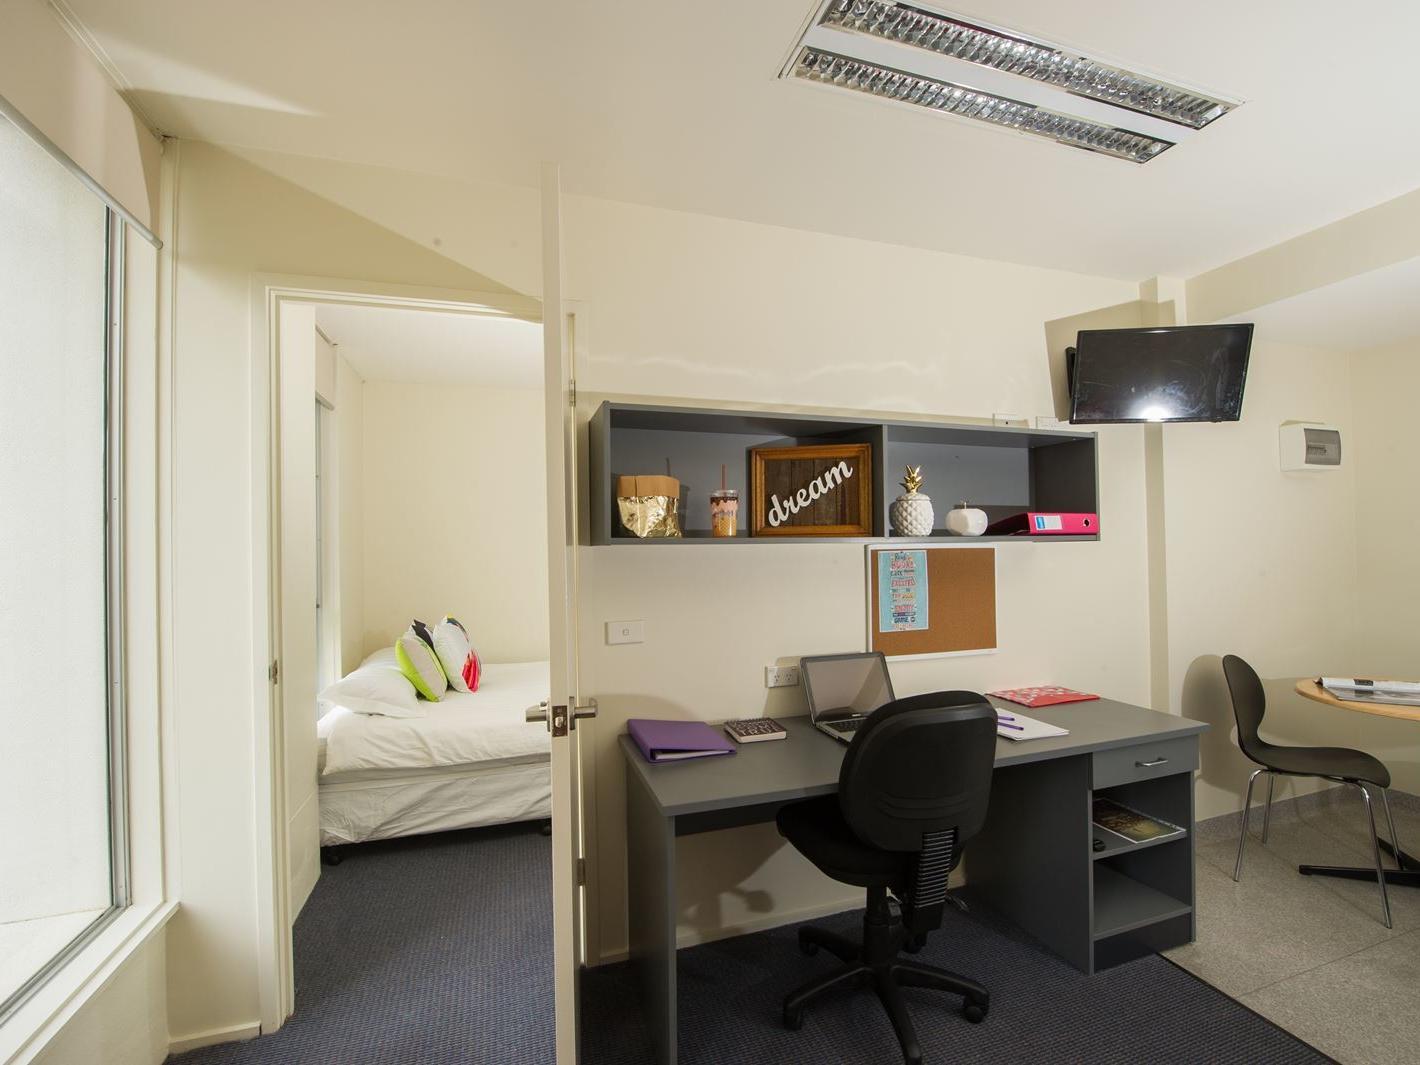 UniLodge Academie House_One Bedroom Apartment